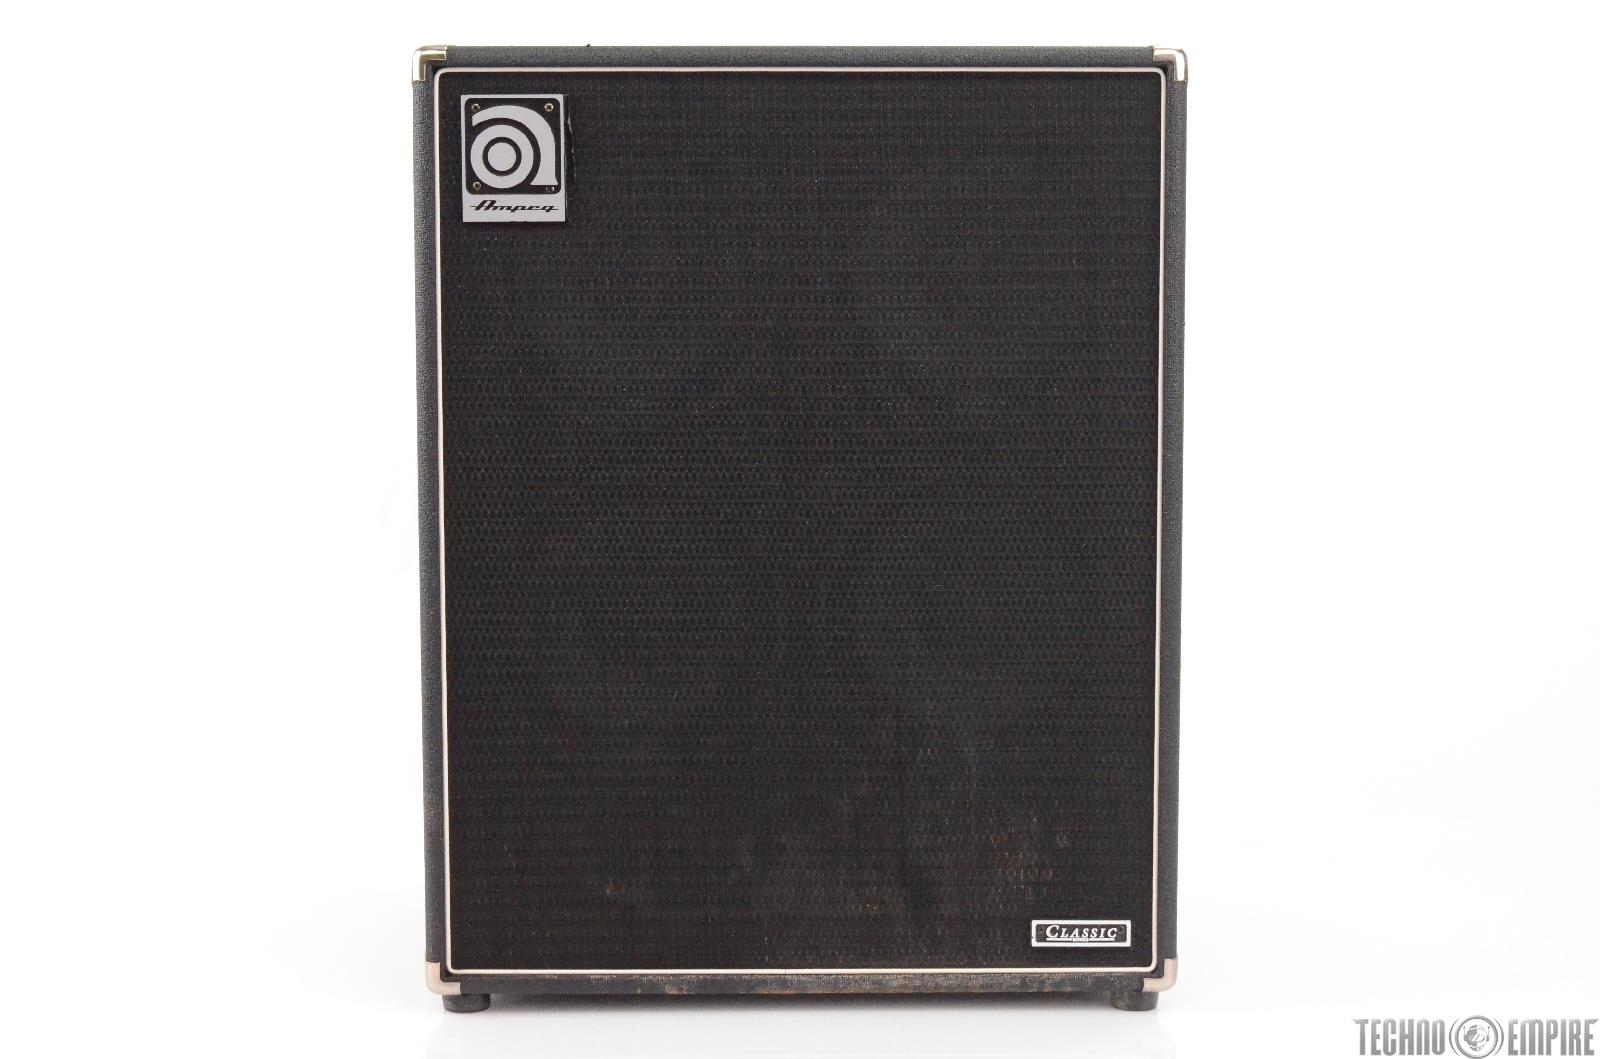 AMPEG SVT-410HLF 4x10 500W 4Ω Ohms Bass Cabinet #27943